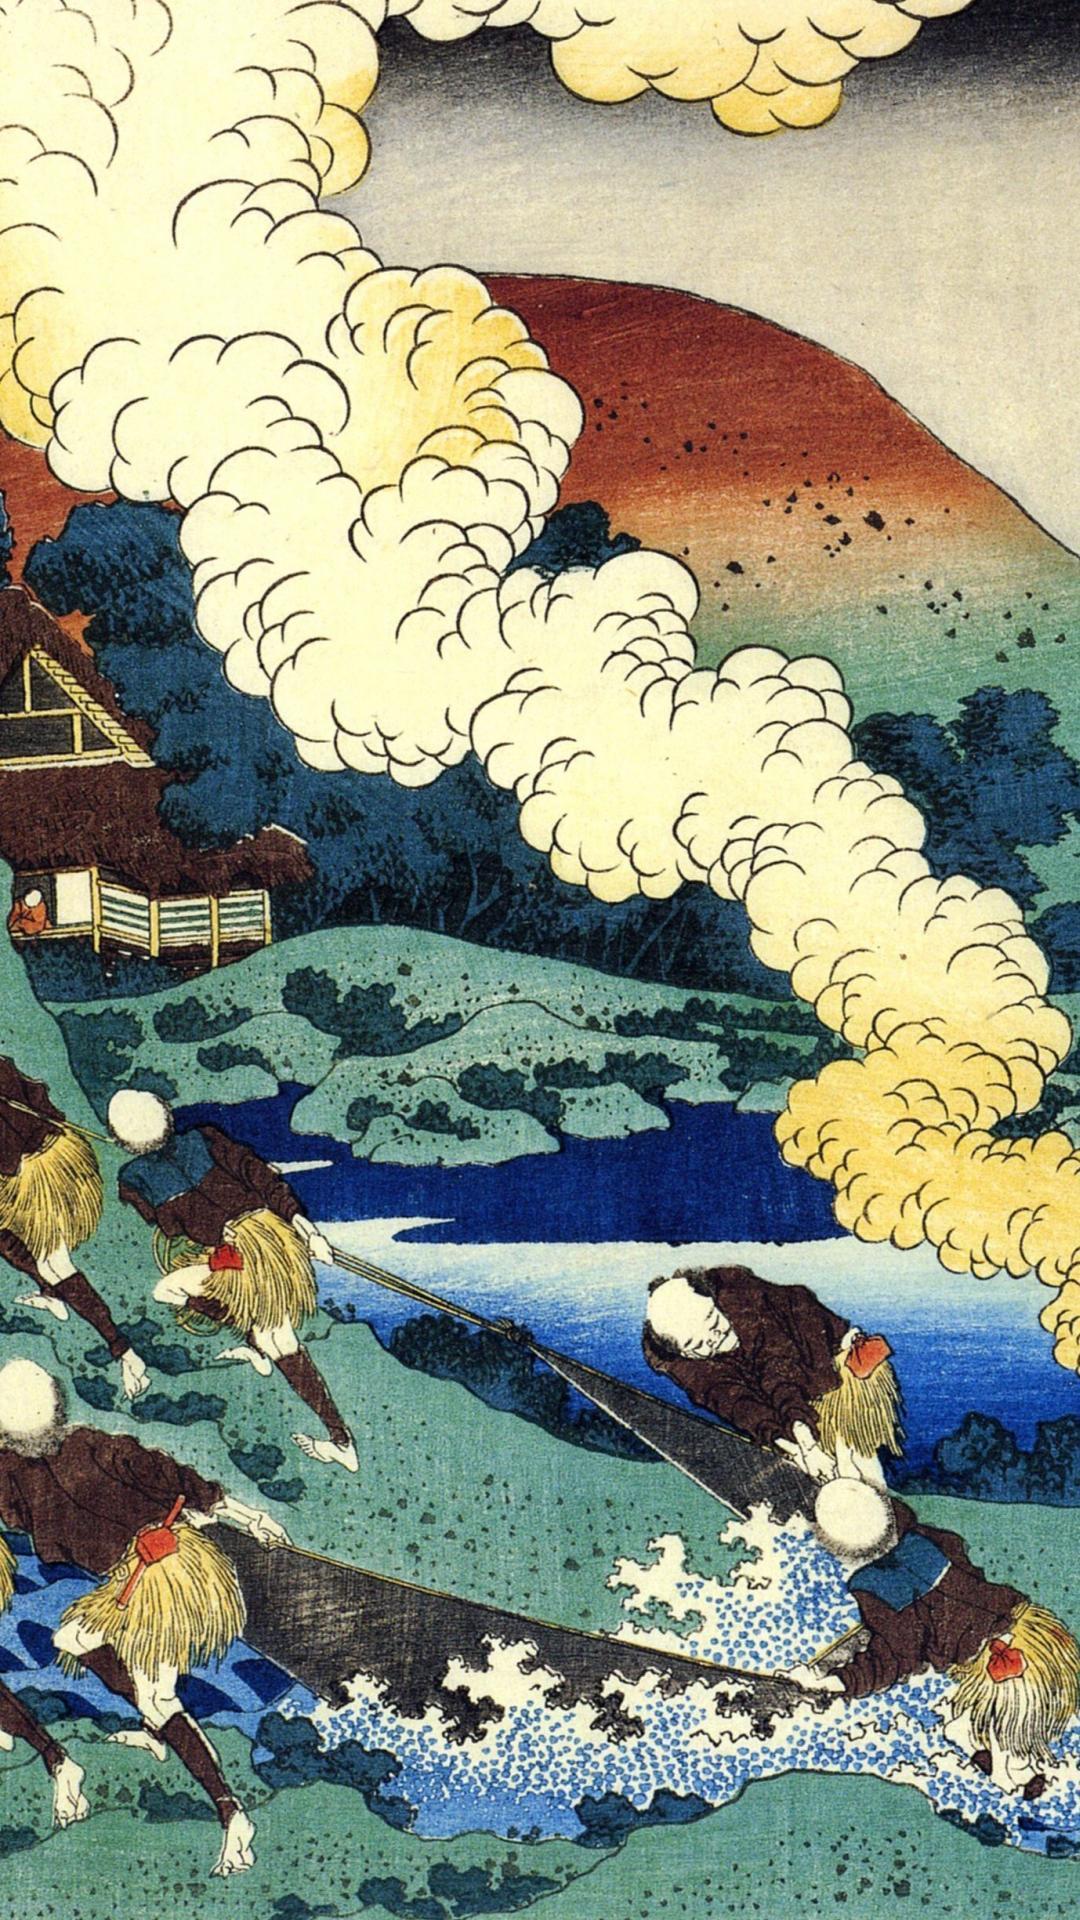 Hokusai Katsushika Wallpapers   Top Hokusai Katsushika 1080x1920